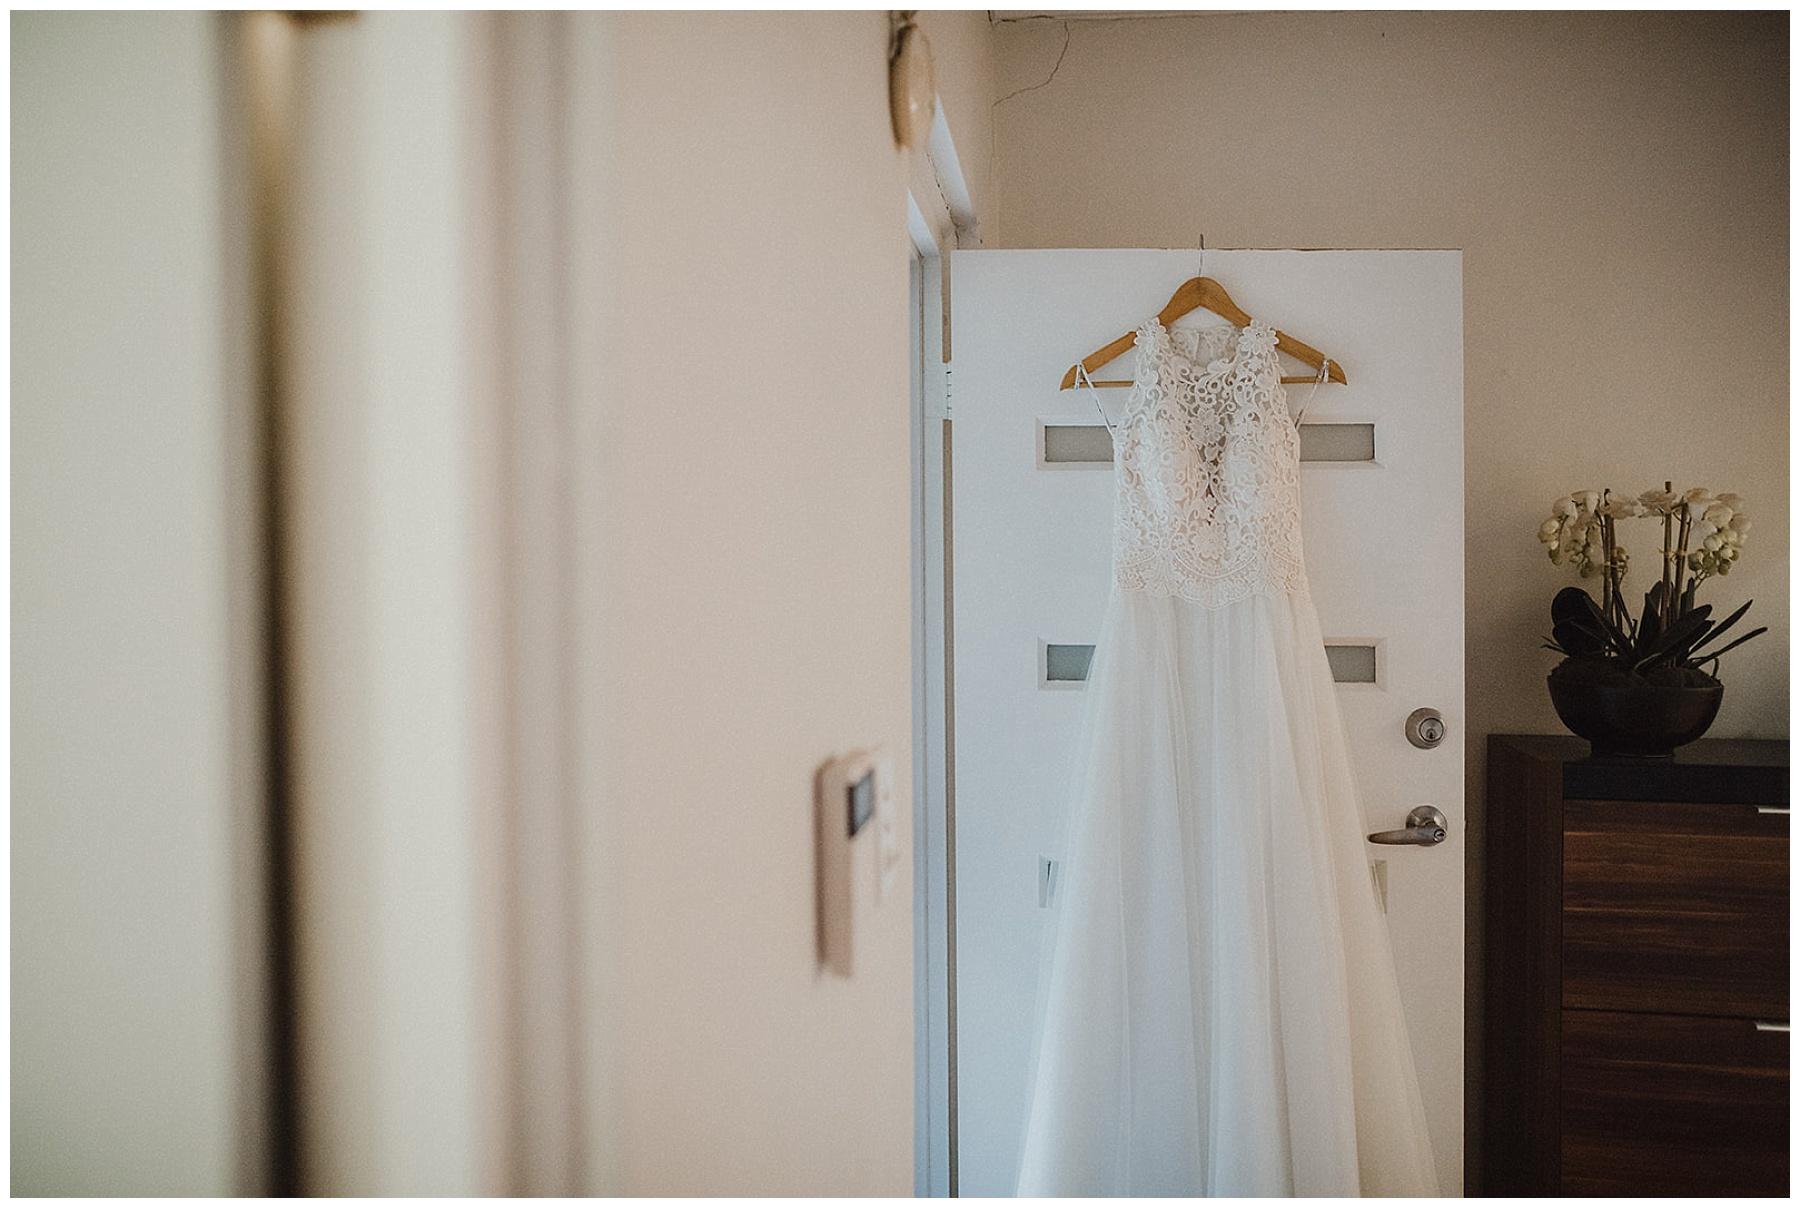 Shot of the Bride's wedding dress